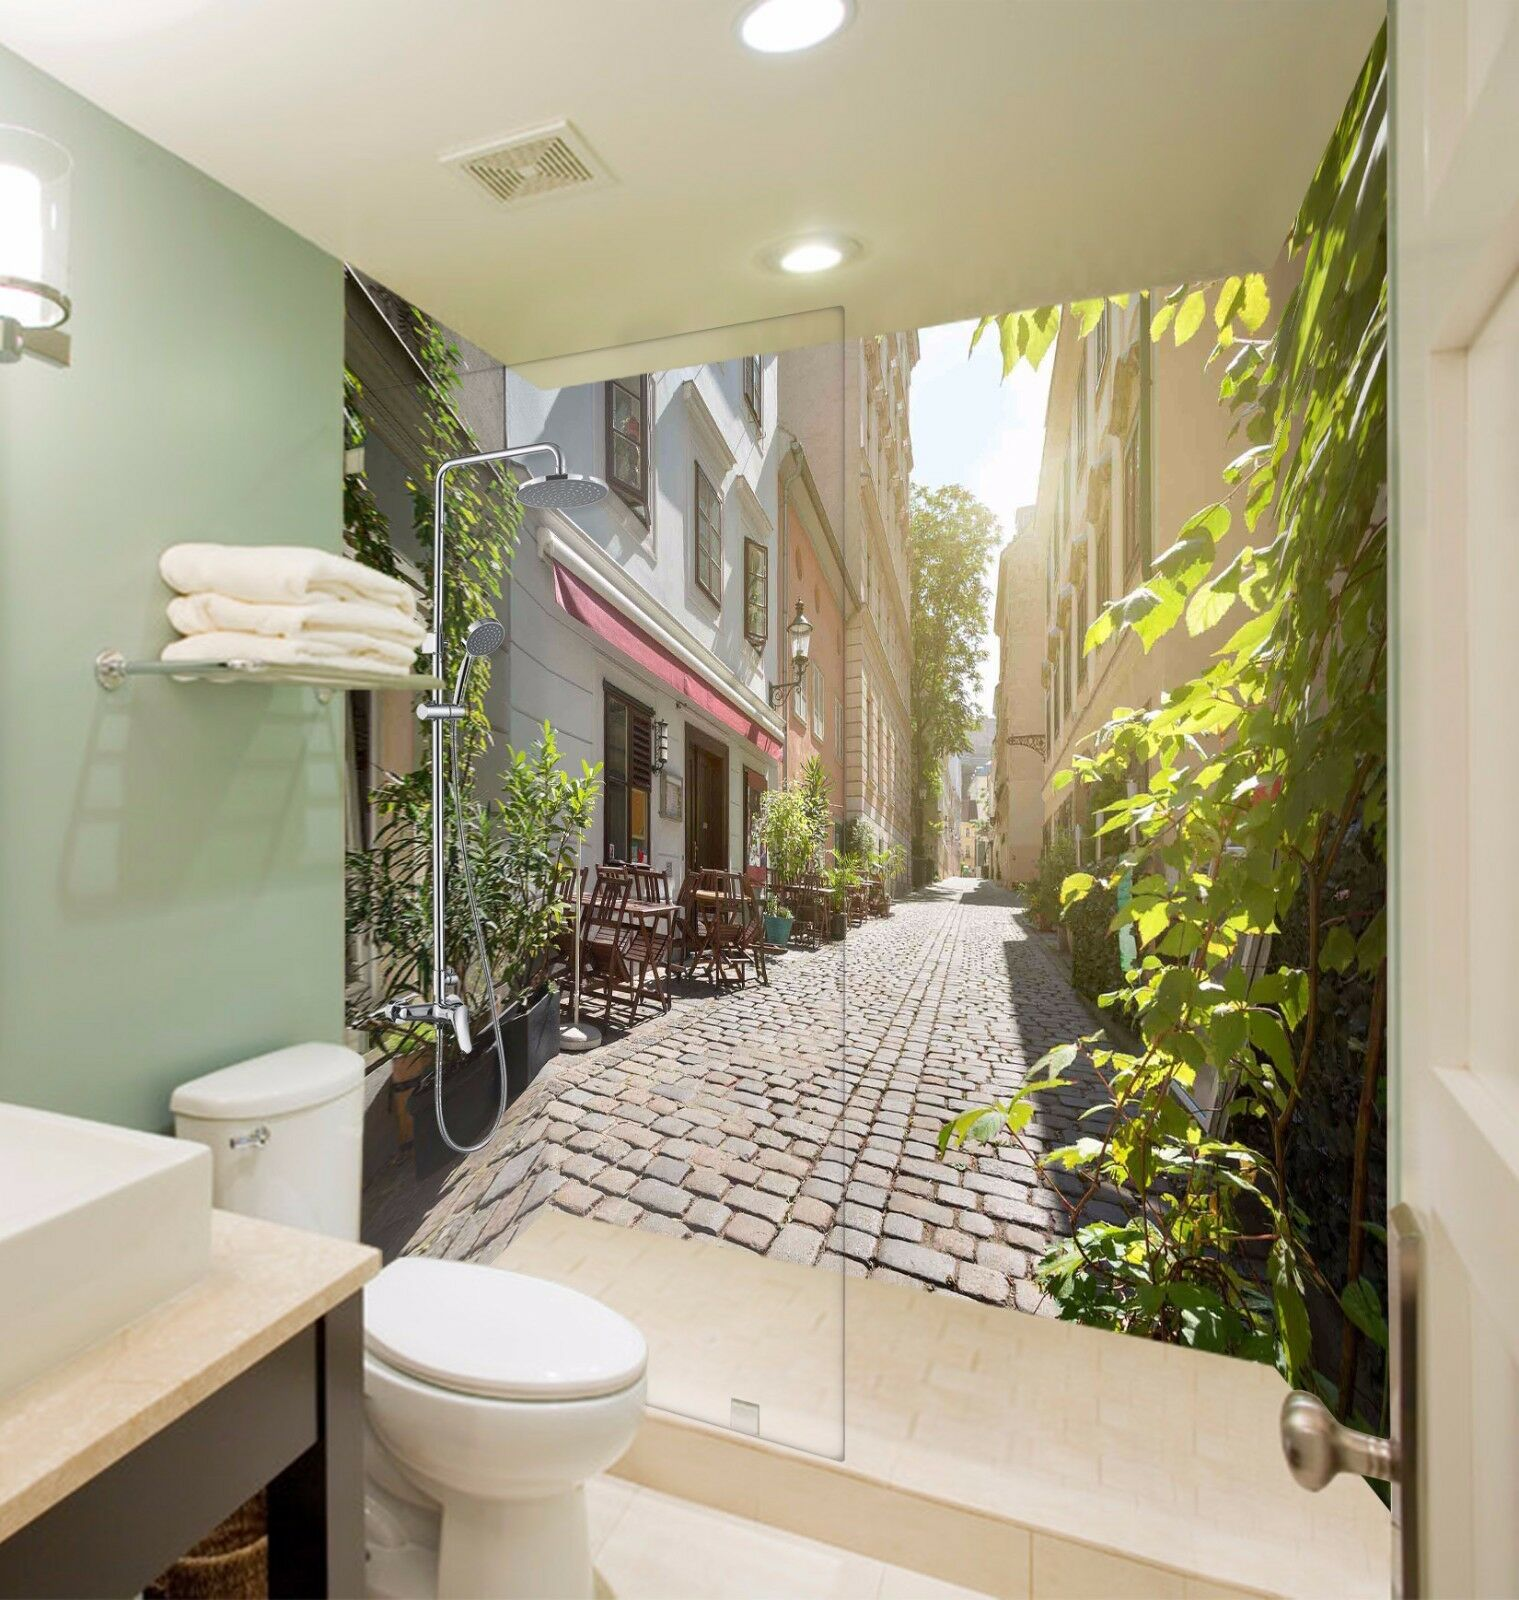 3D Street House 512 WallPaper Bathroom Print Decal Wall Deco AJ WALLPAPER AU